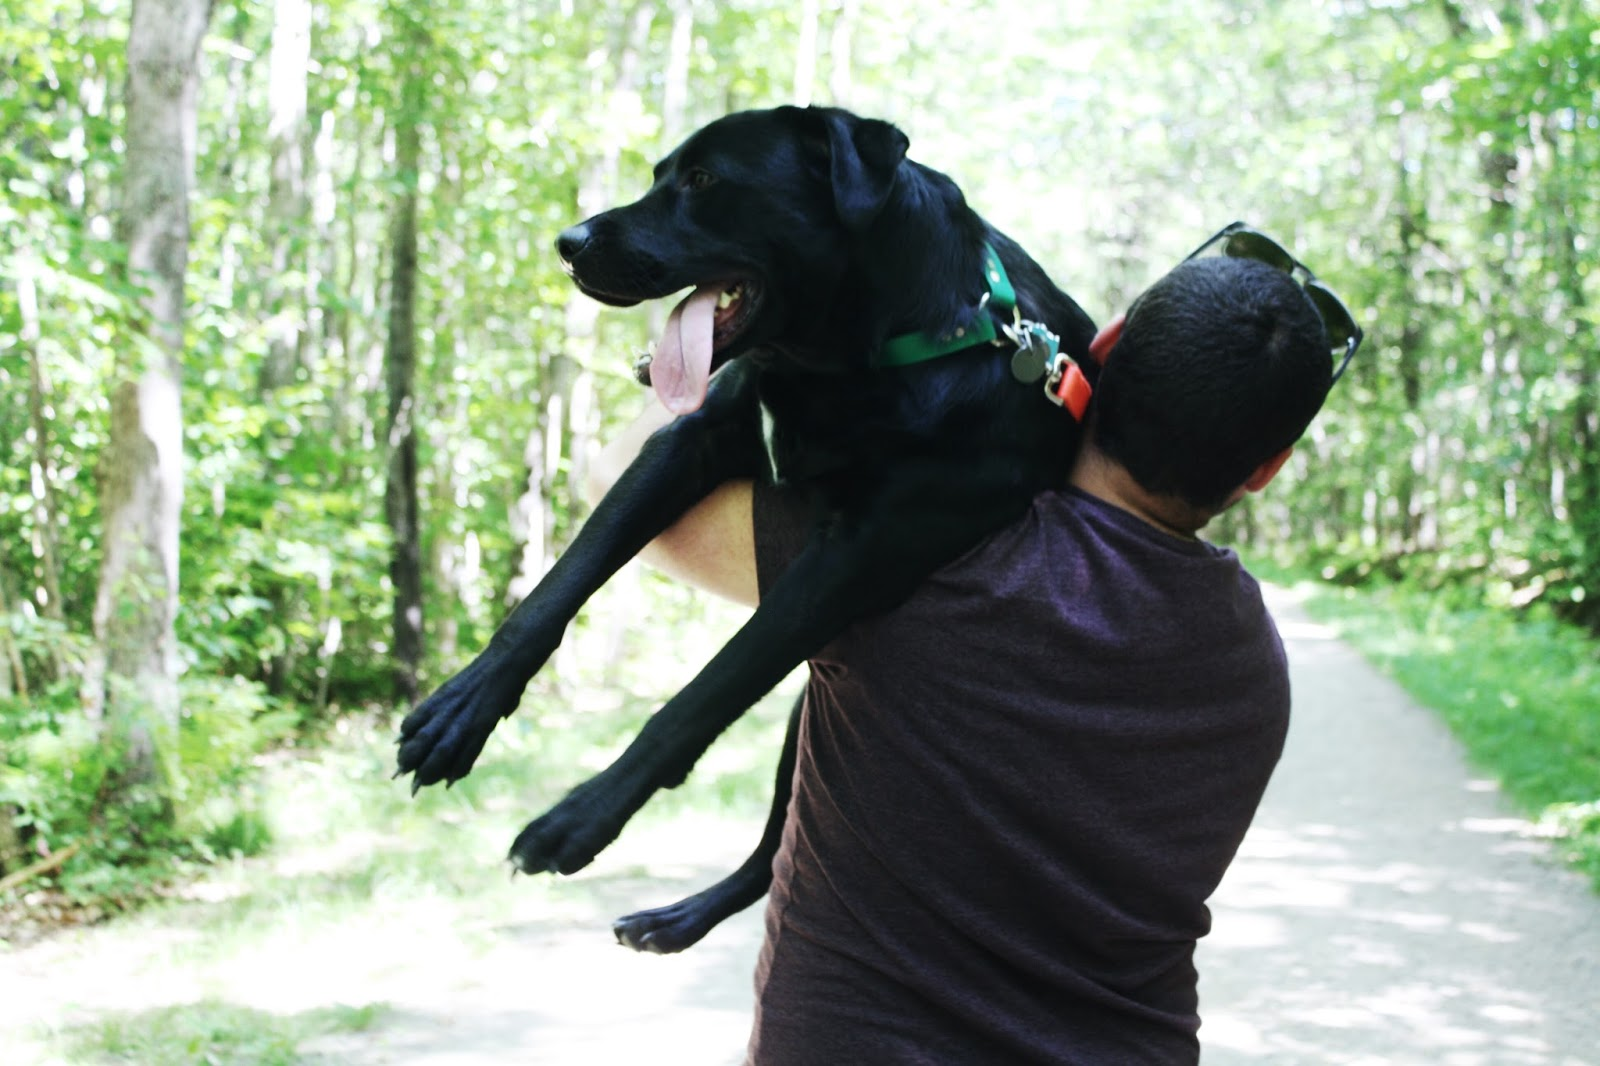 Bald Rock Mountain Trail, things to do near Camden Maine, dog friendly camden maine